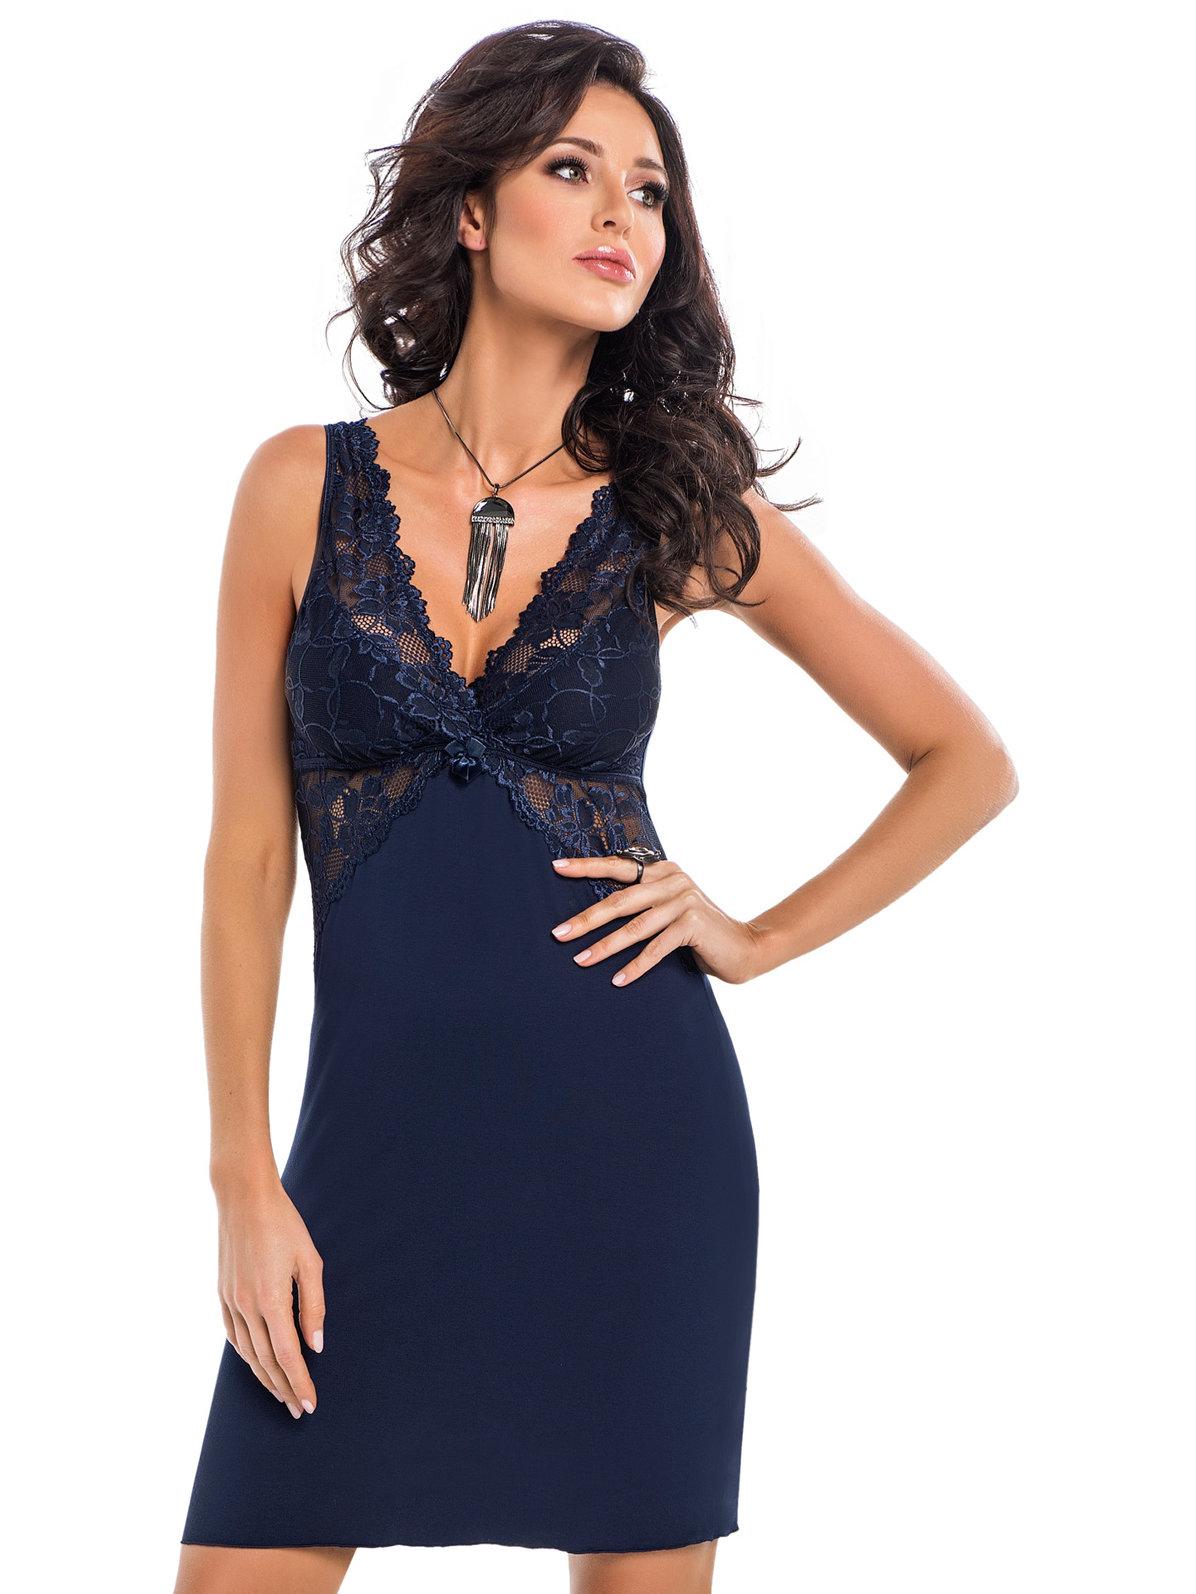 Chemise Irina Granatowa Albastru - Imbracaminte sexy